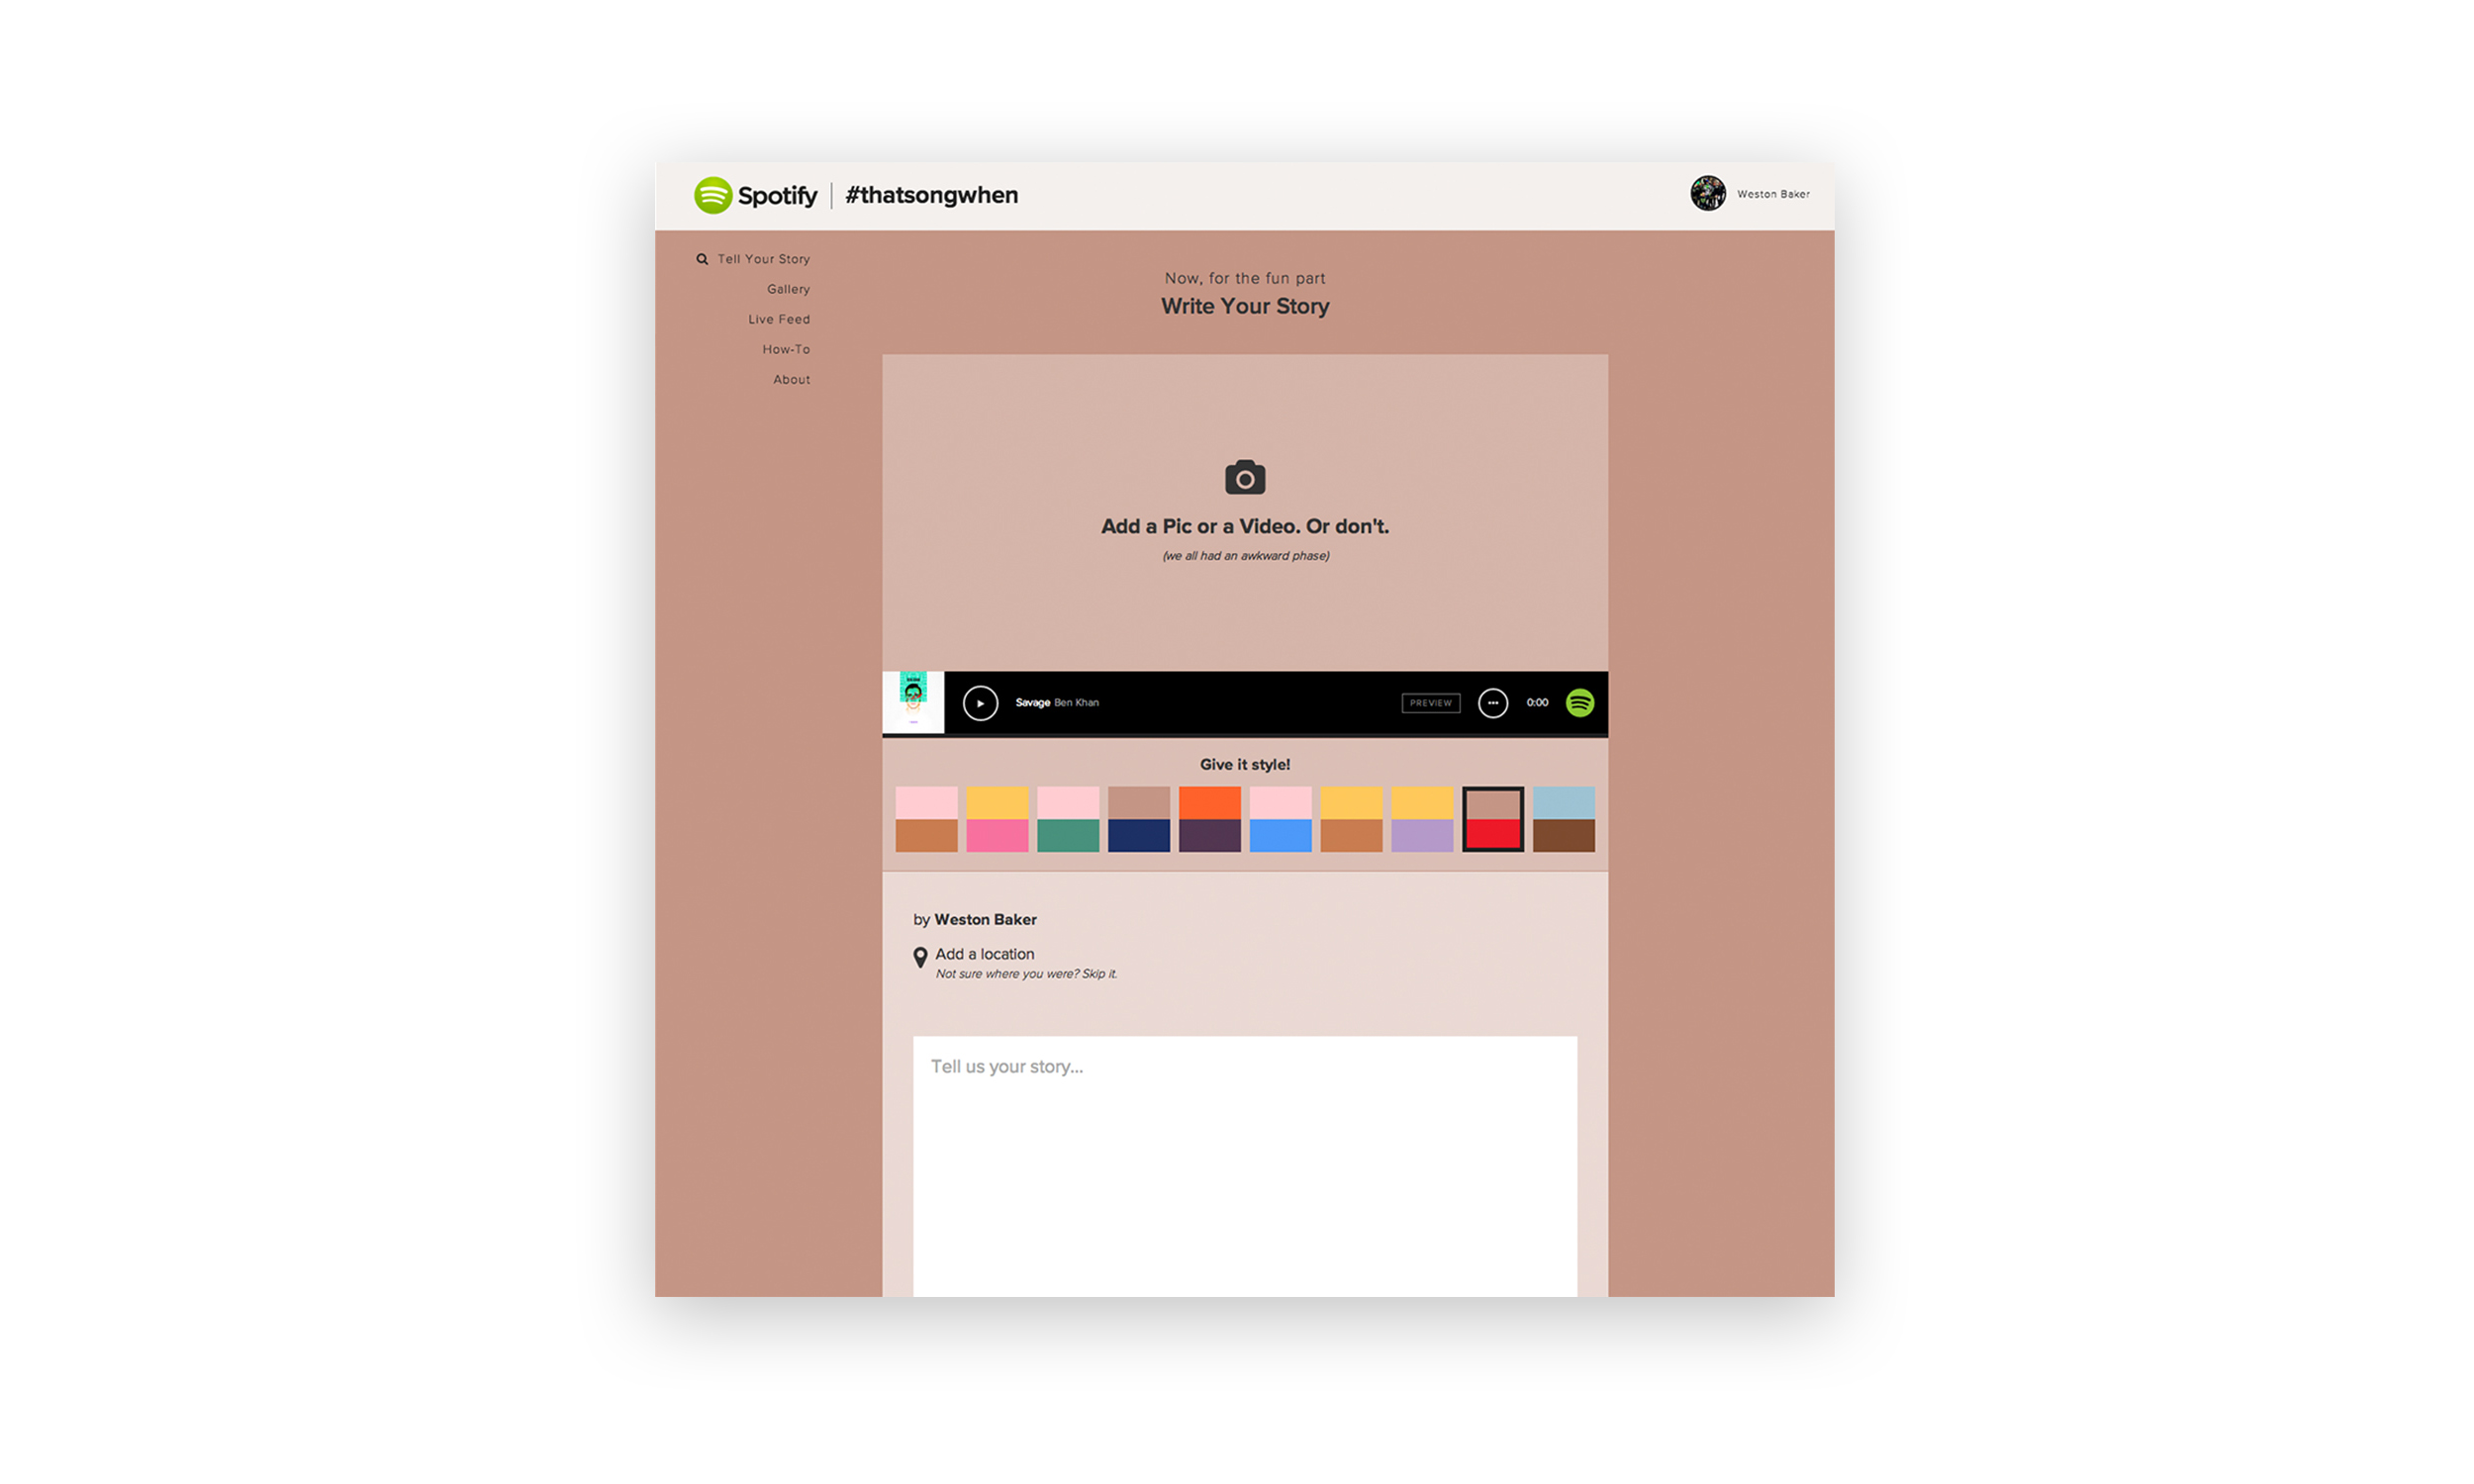 Spotify-thatsongwhen-screens6.jpg